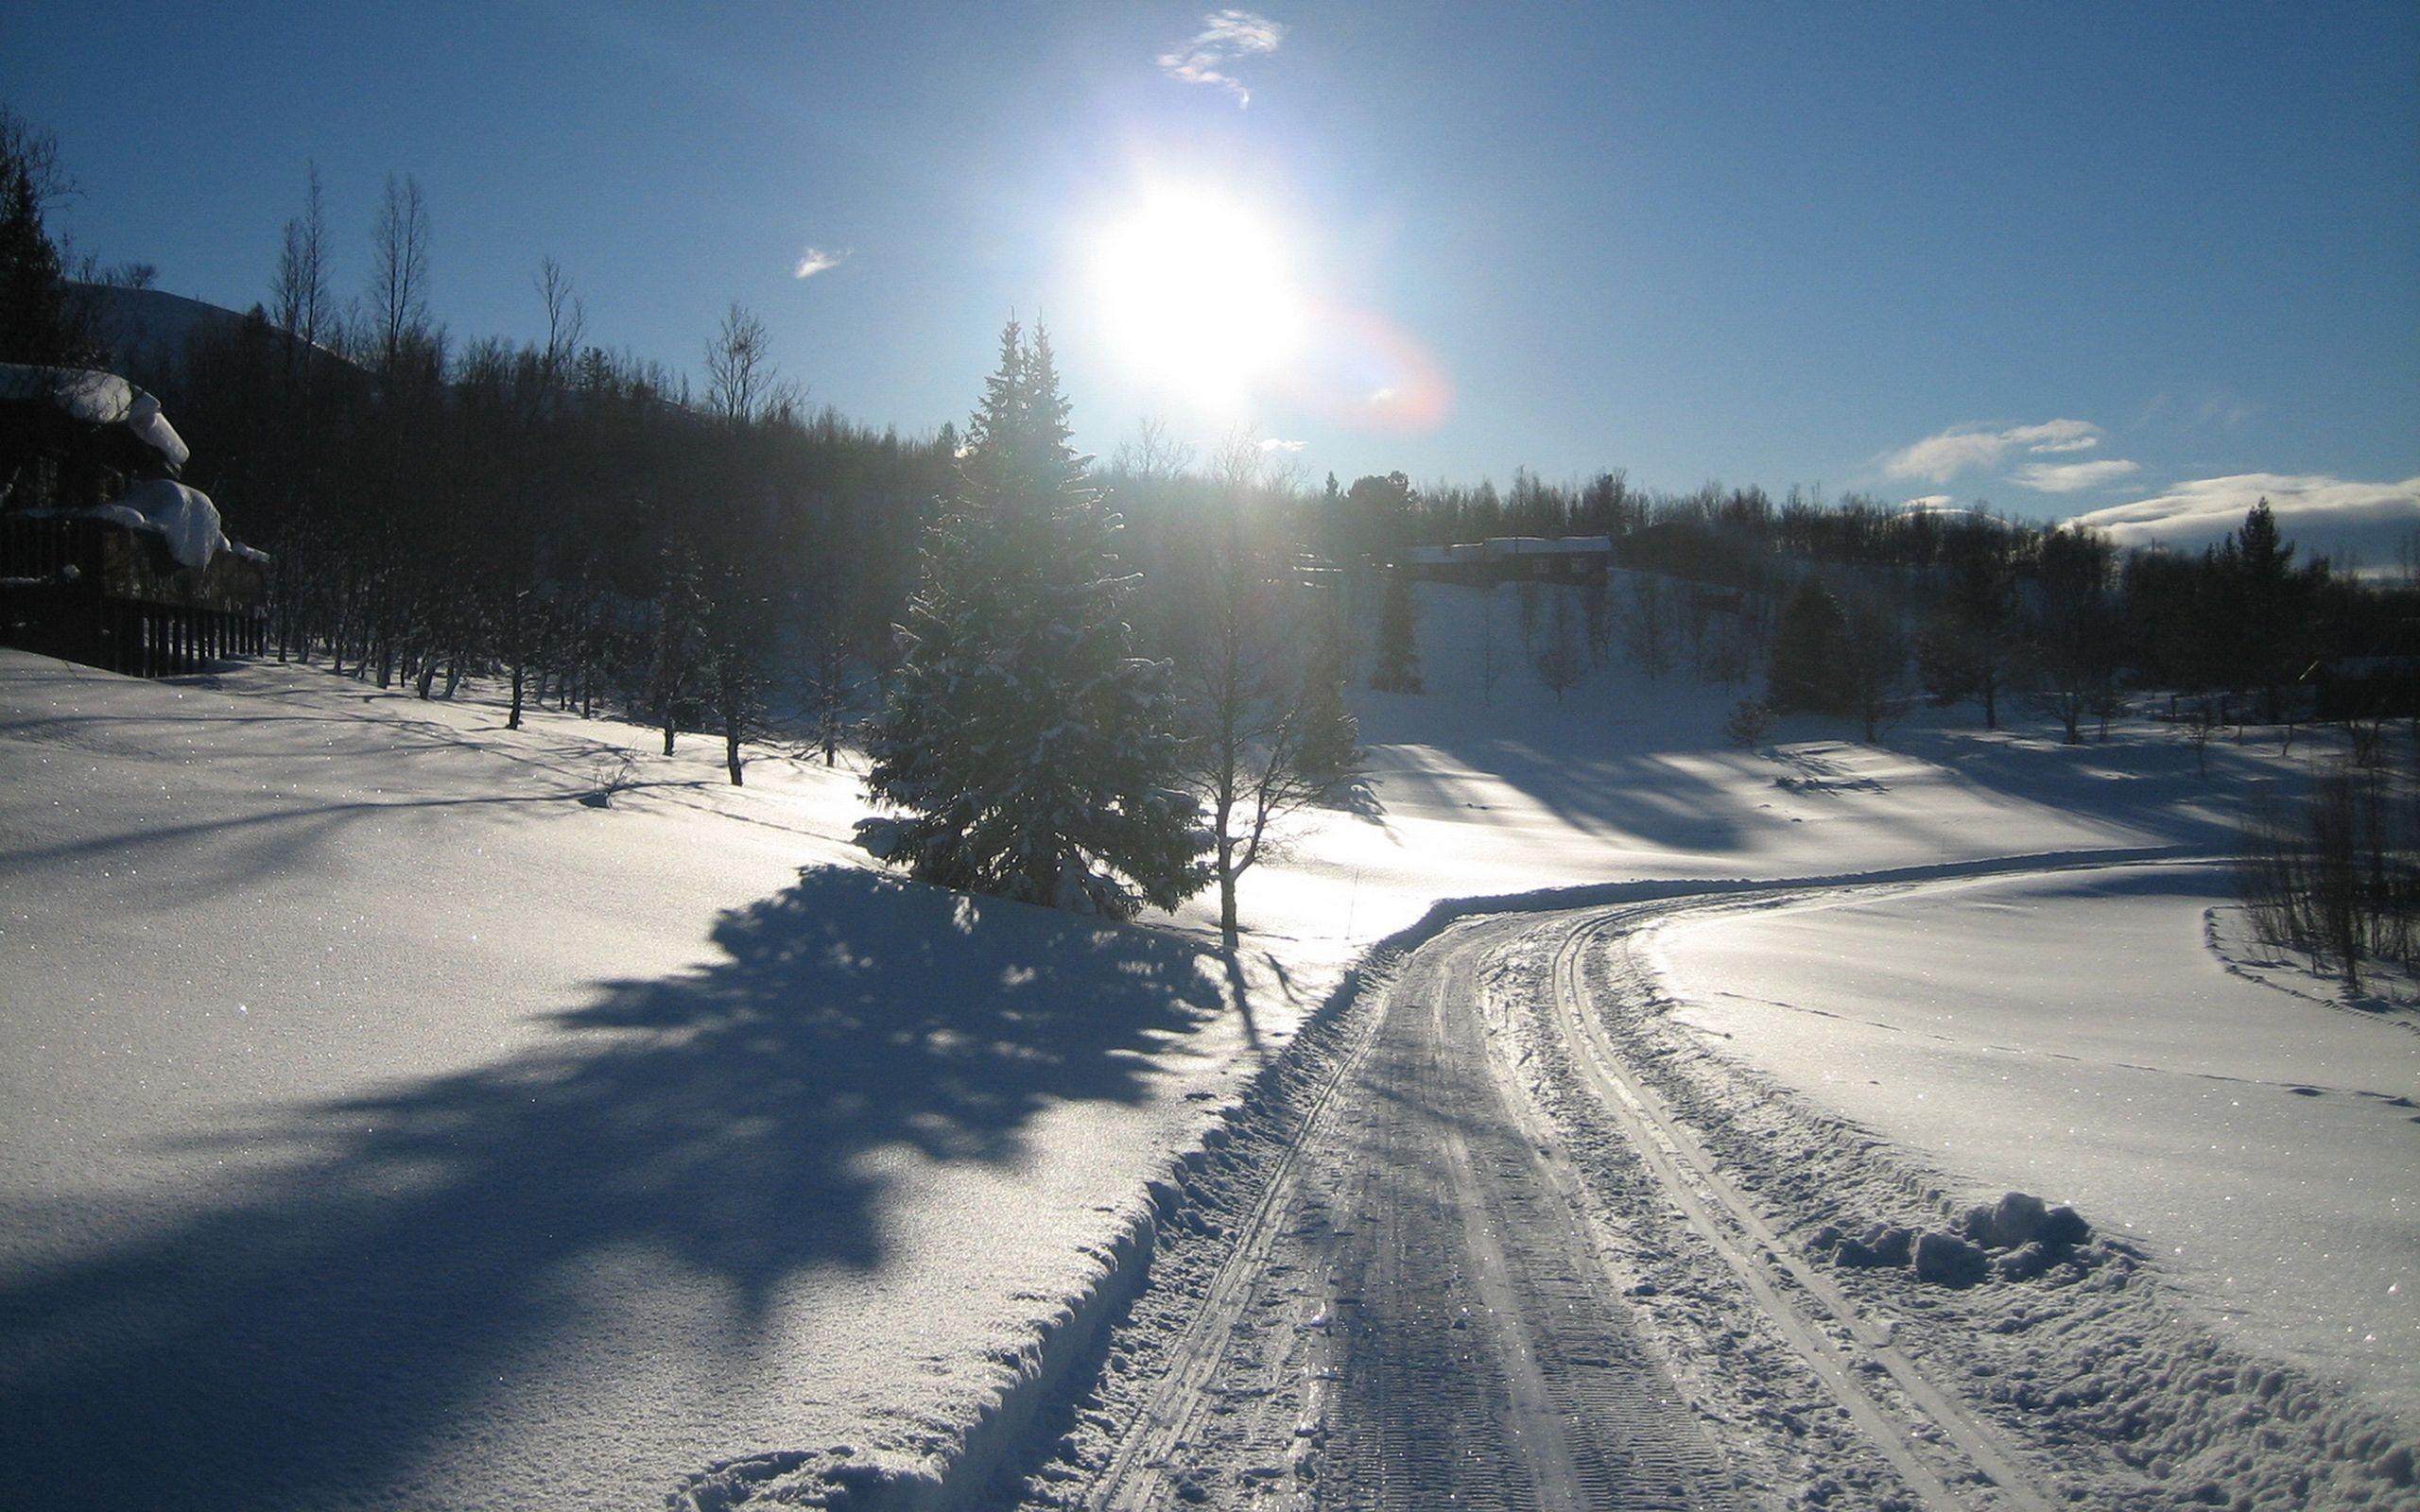 Wallpaper Snow Road Freezing Weather Season Piste Winter